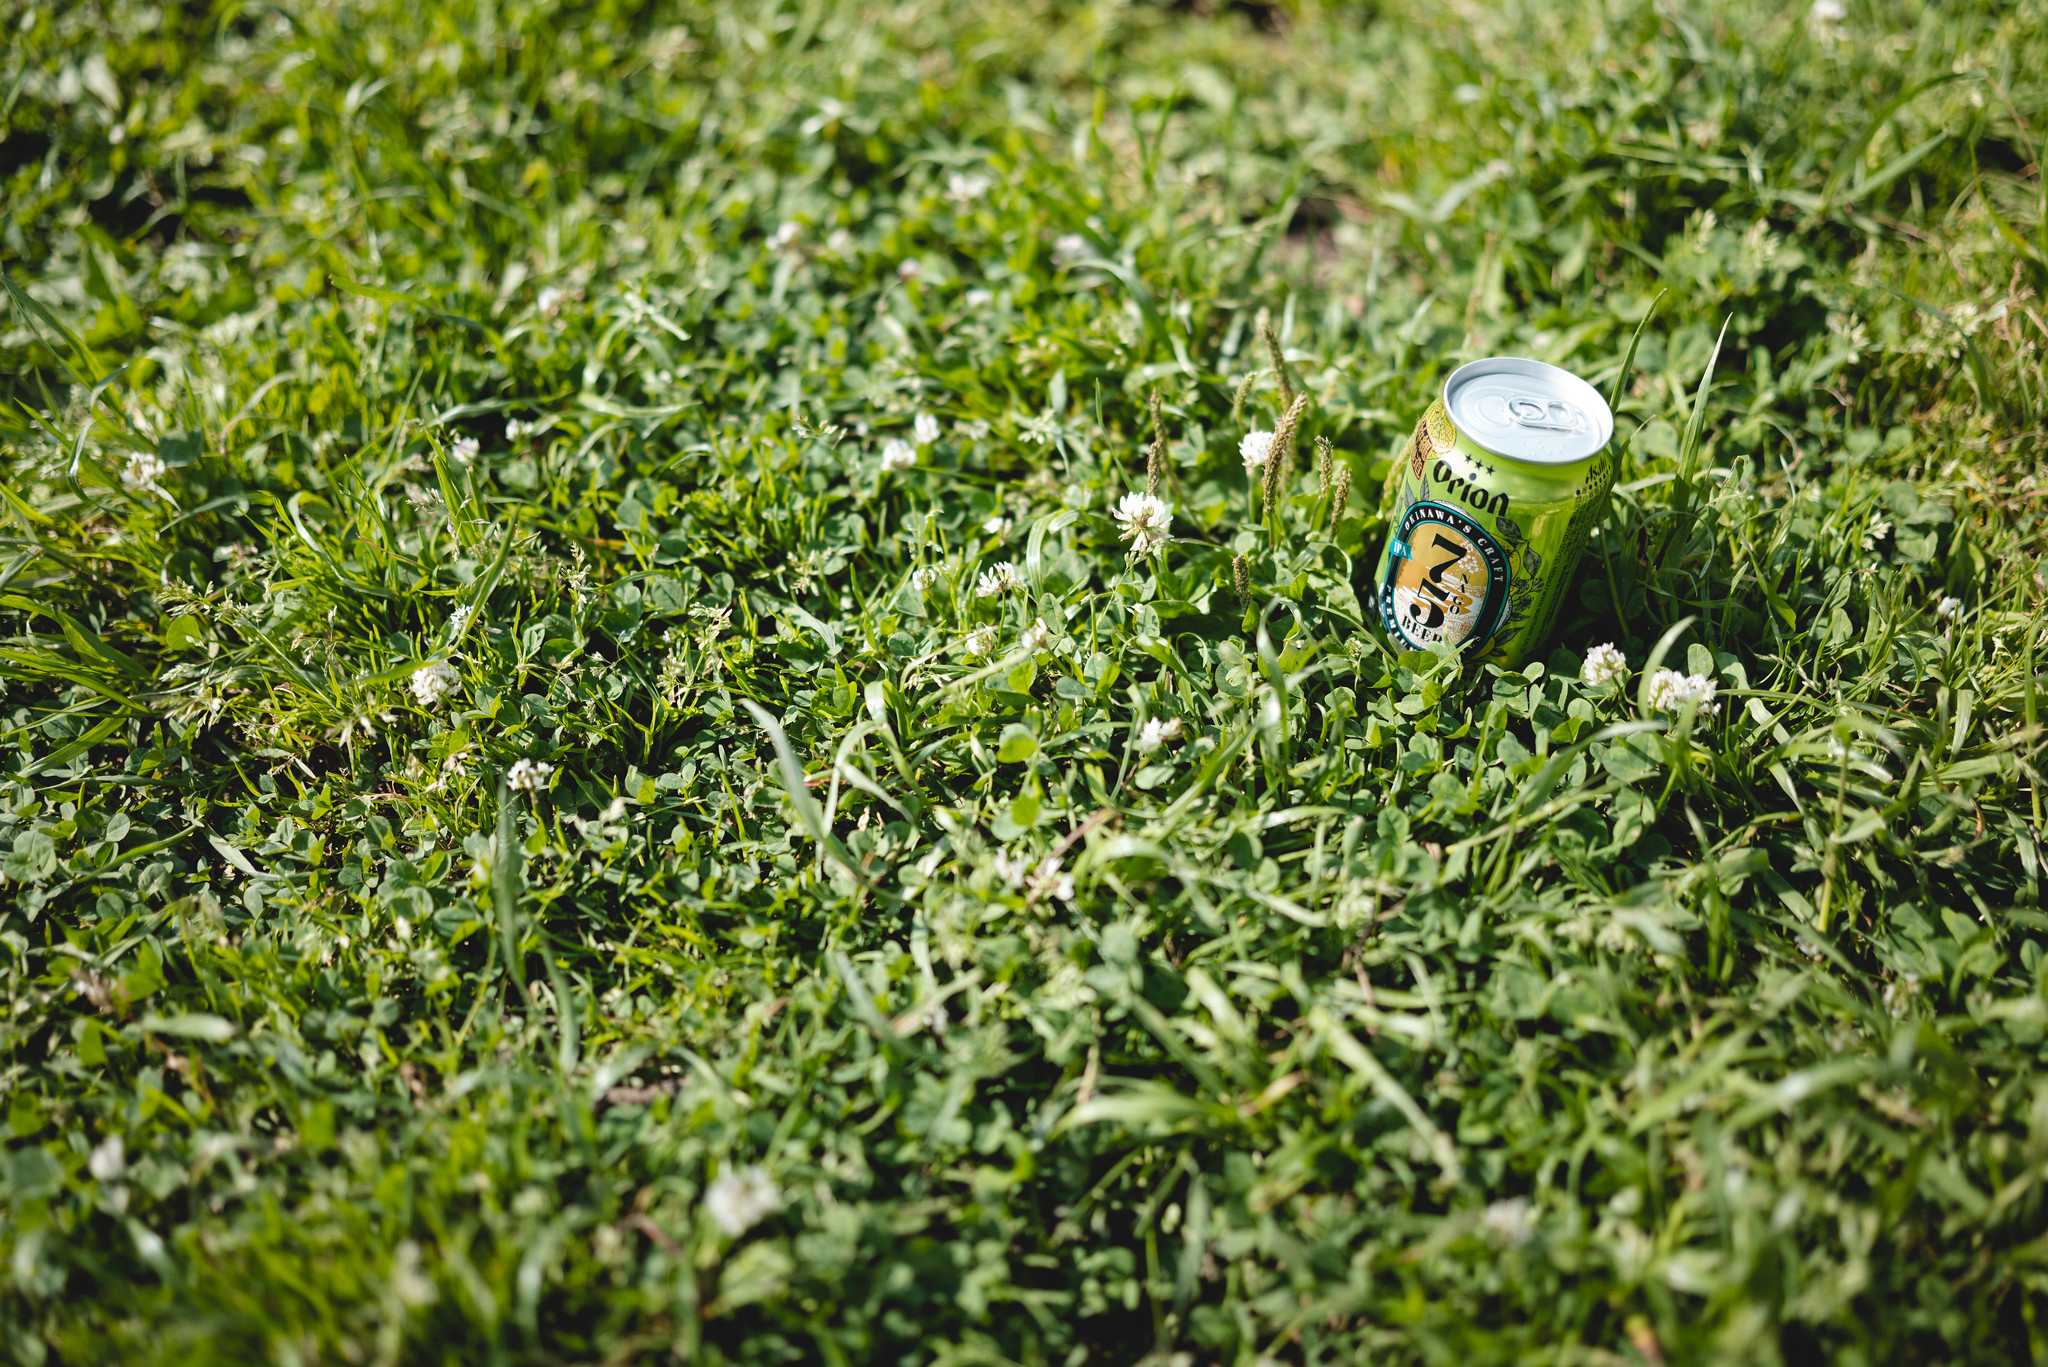 Beer harvest